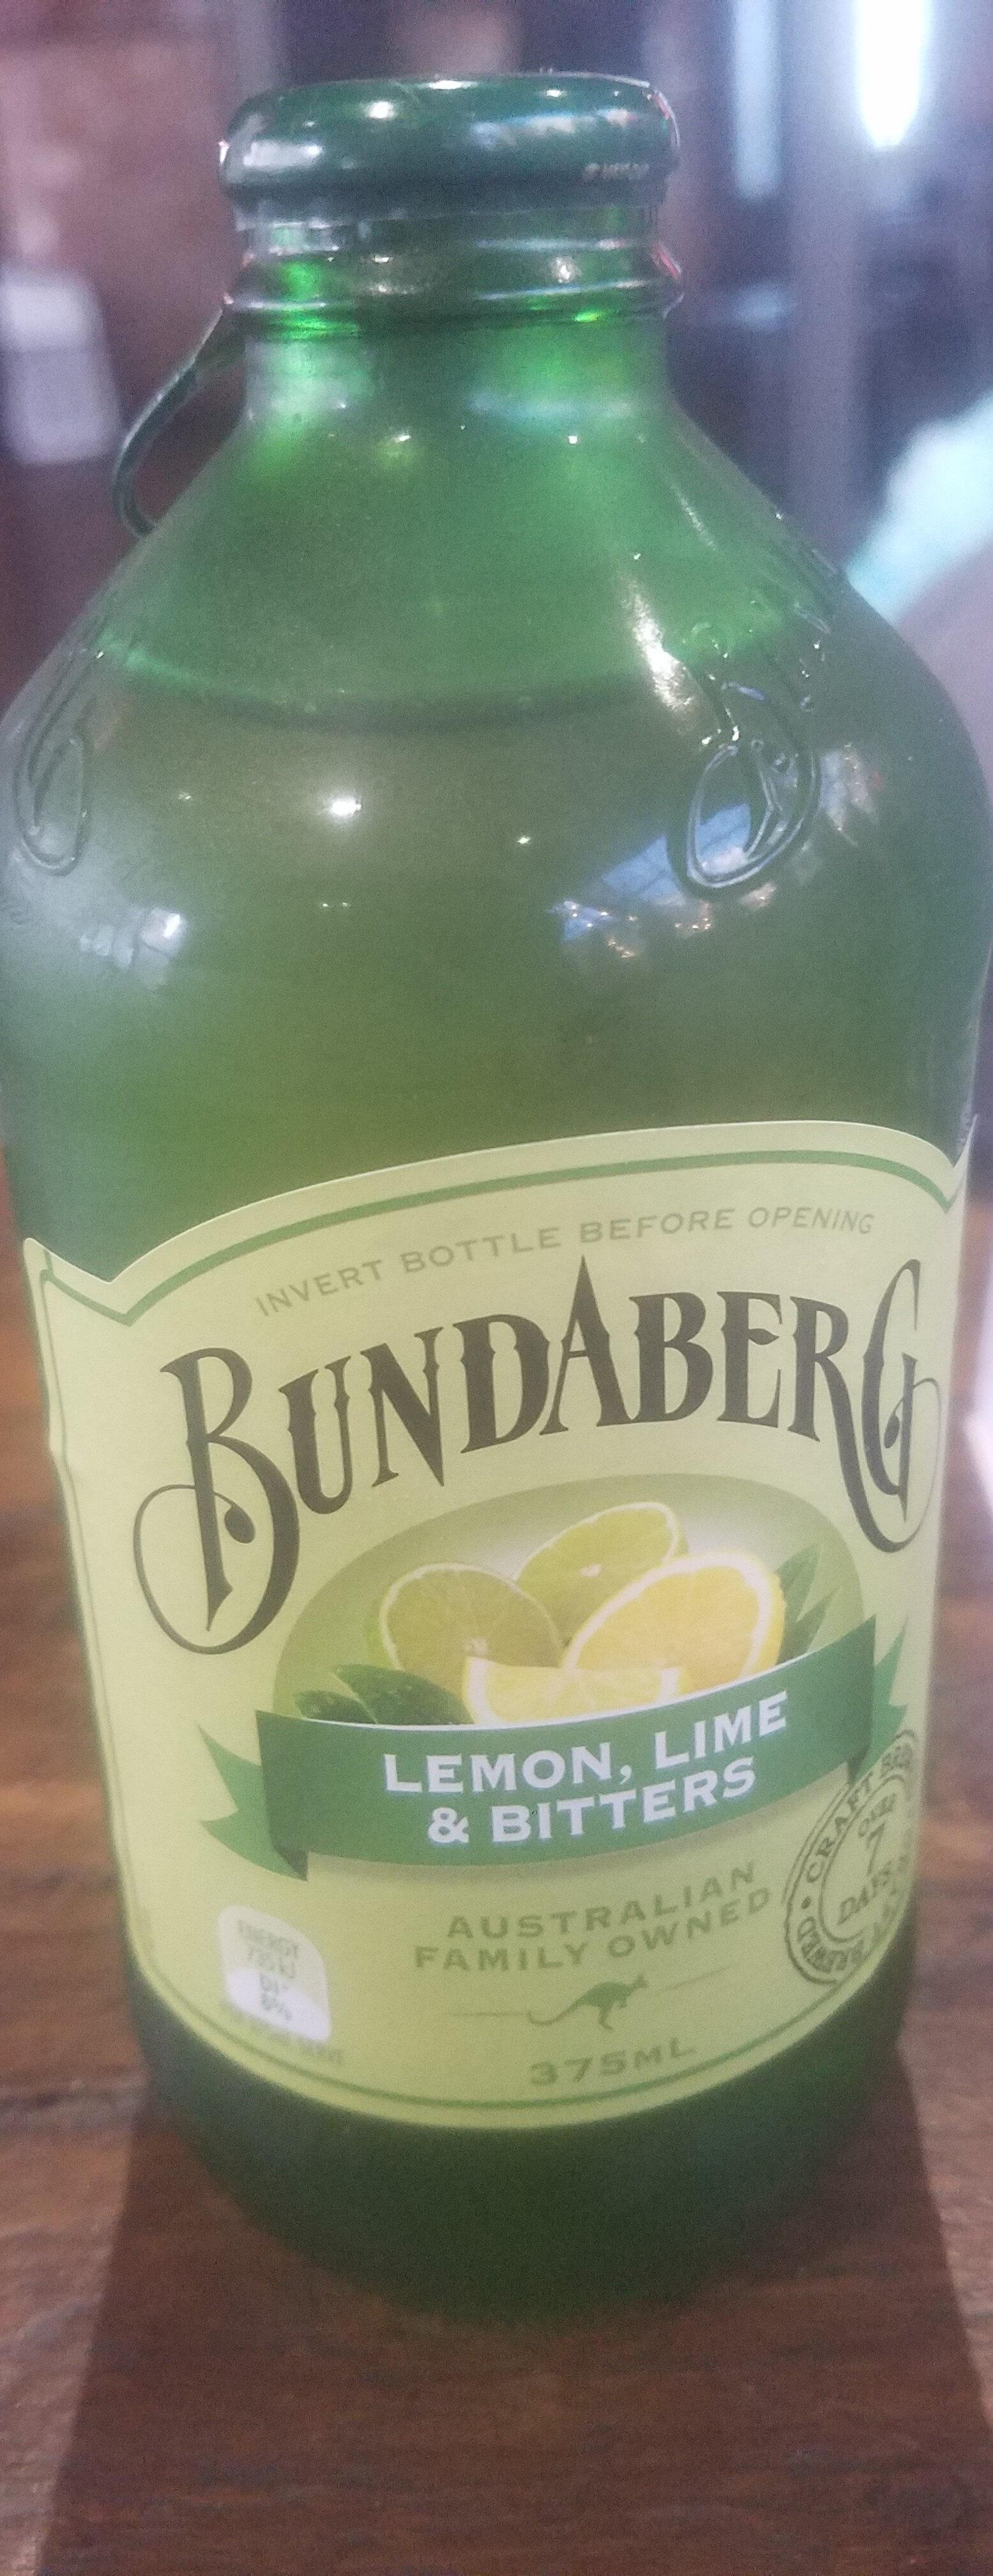 Lemon Lime and Bitters - Product - en